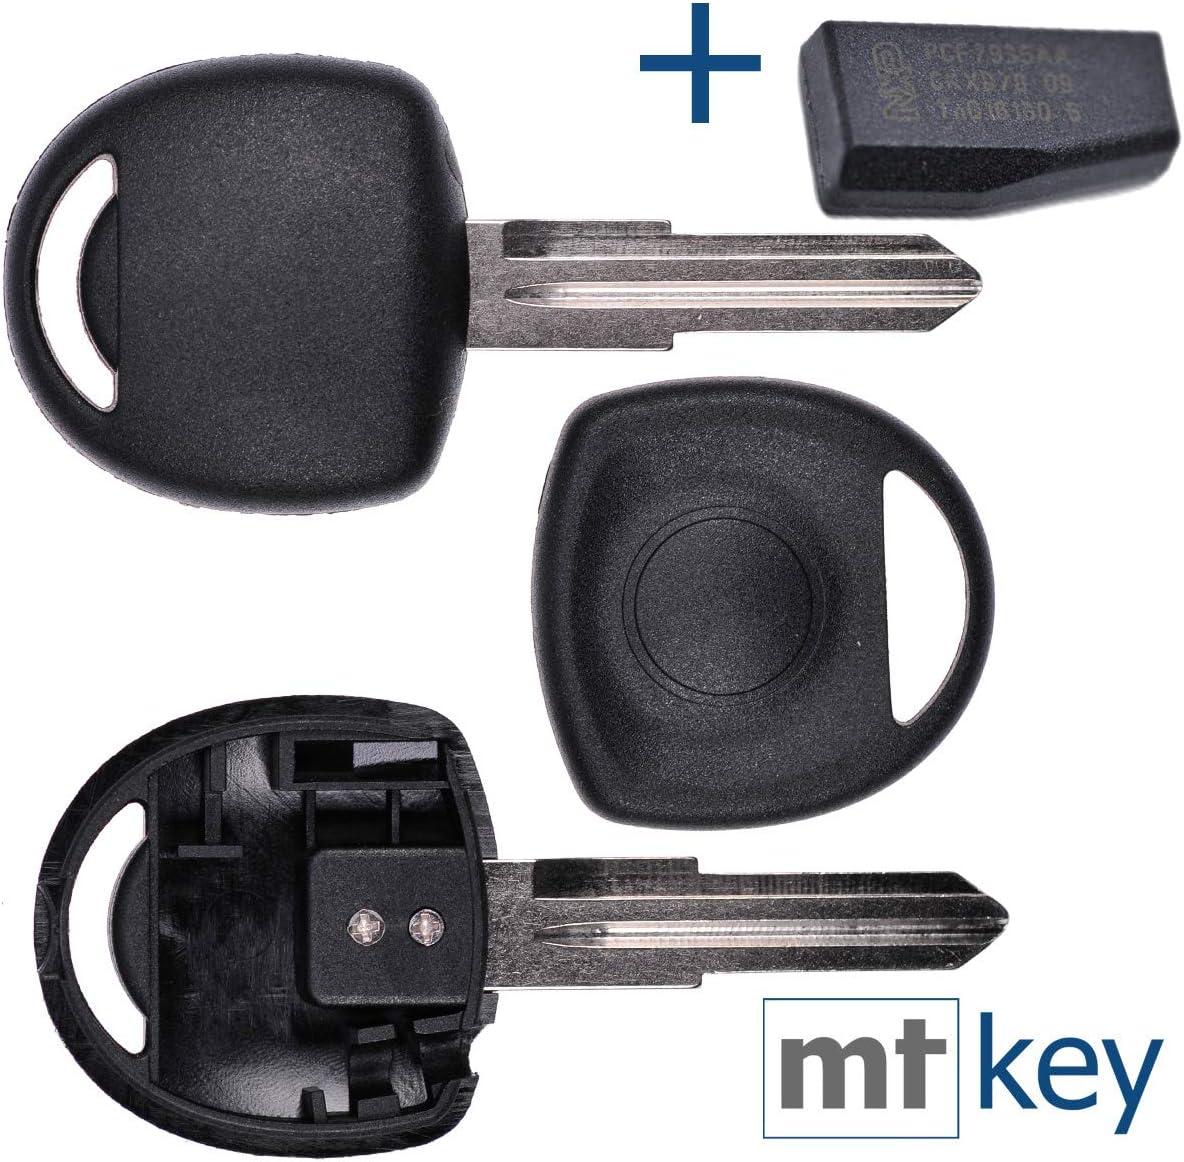 Auto Schlüssel Rohling Ym28 Id40 Transponder Elektronik